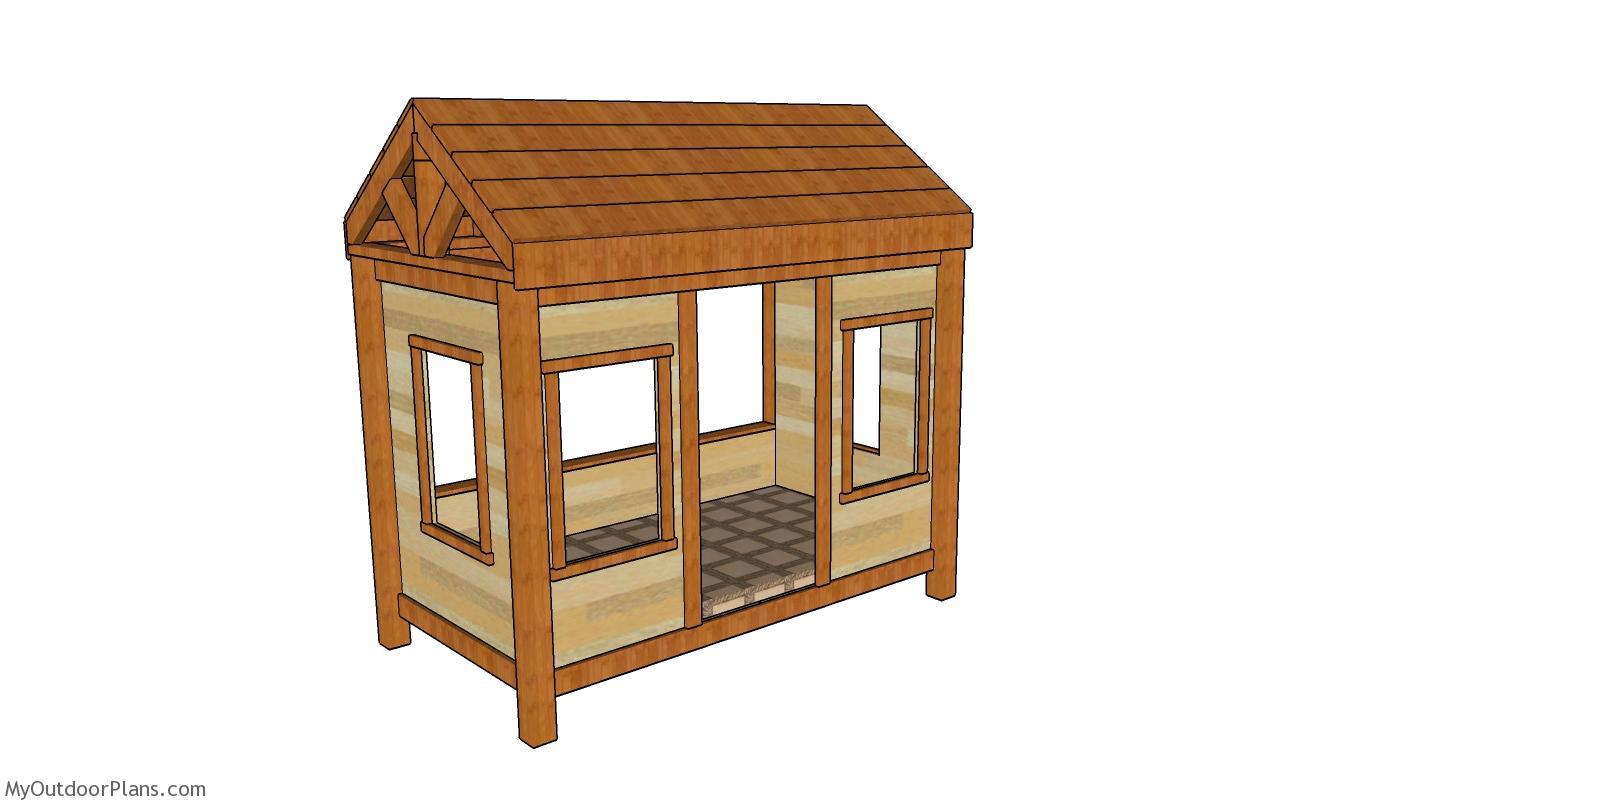 Wood Cabin Bed - Free DIY Plans